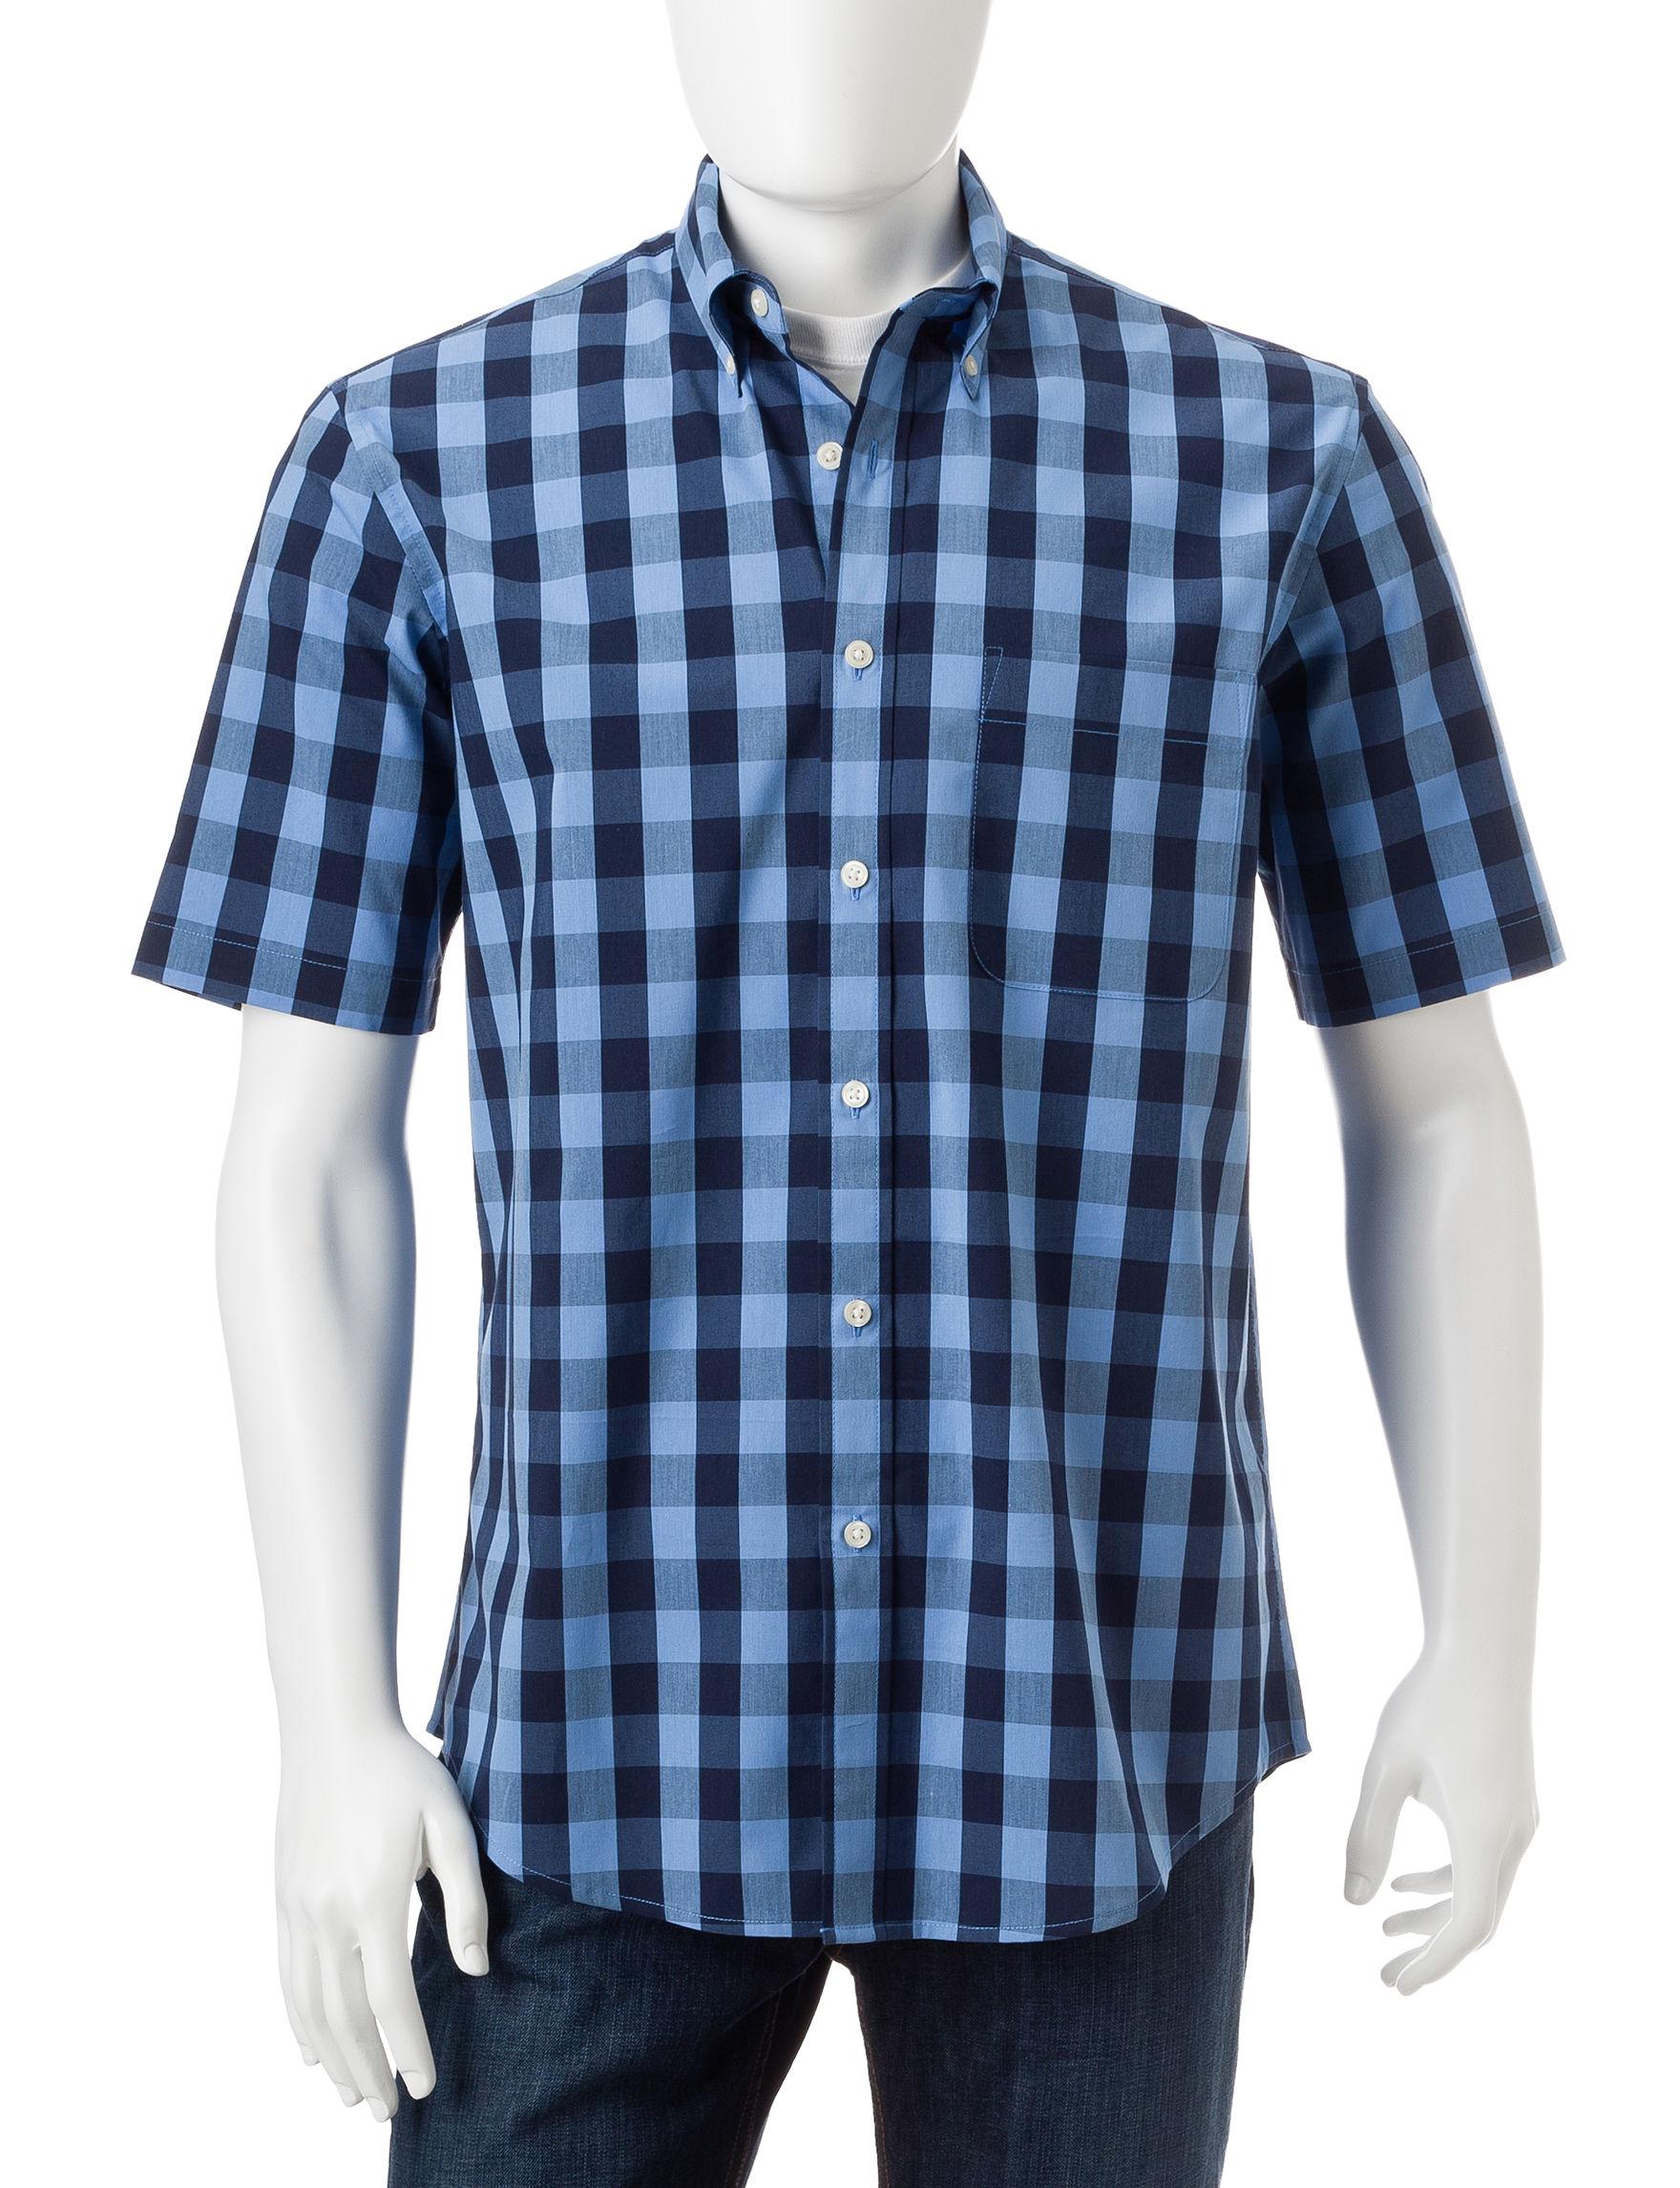 Sun River Lake View Casual Button Down Shirts